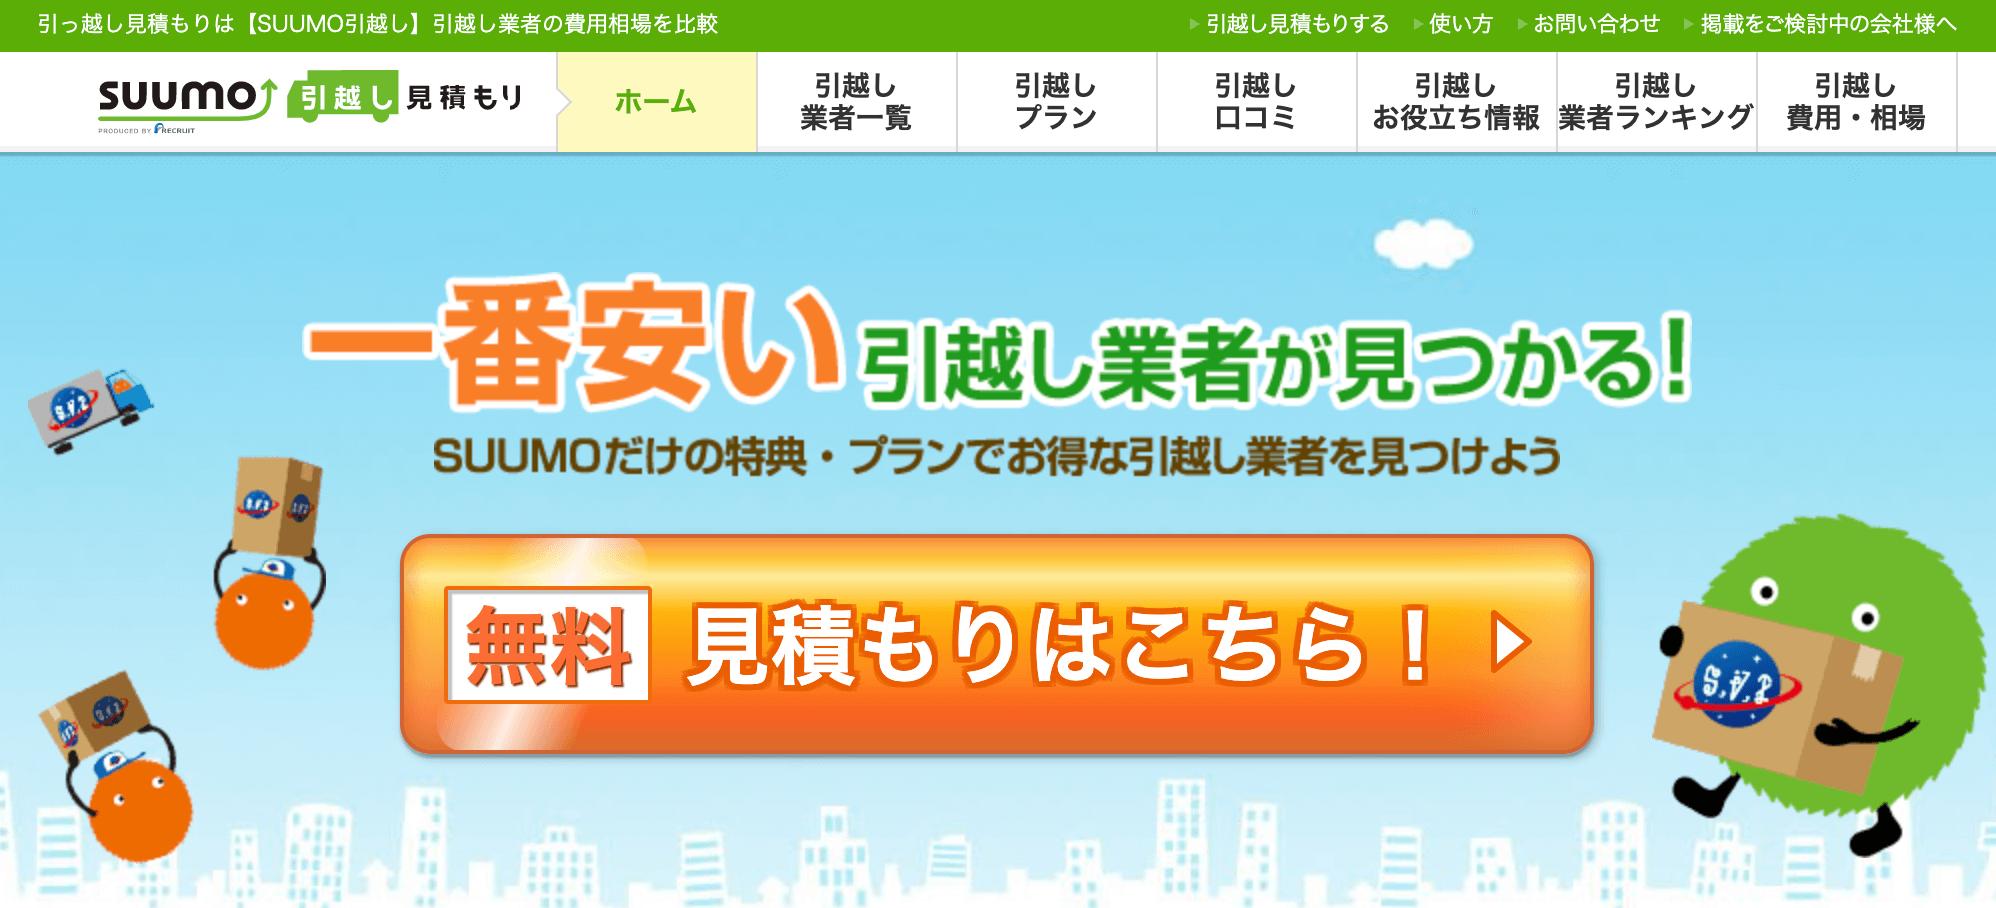 SUUMO引越し トップページ